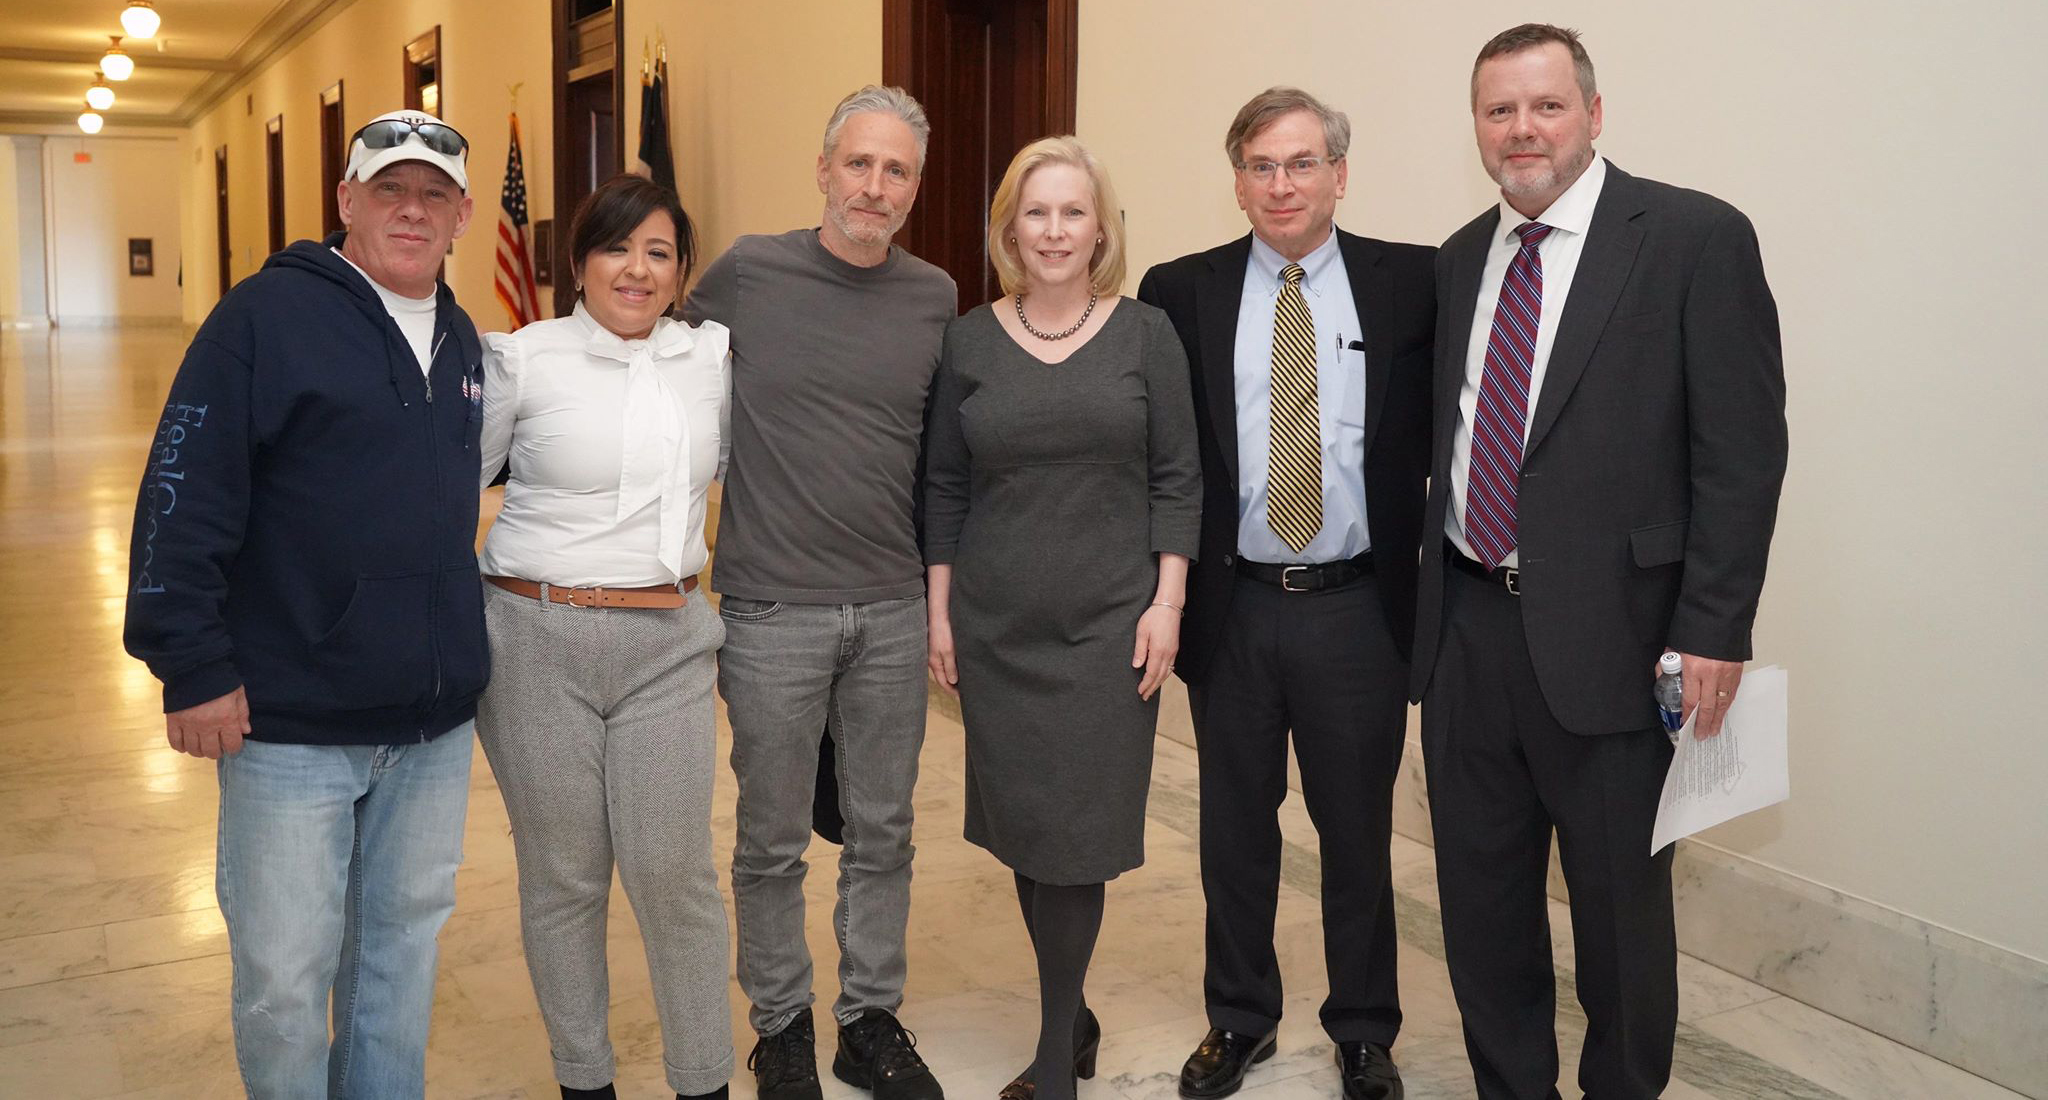 Jon Stewart joins cause of burn pit vets lobbying efforts on Capitol Hill